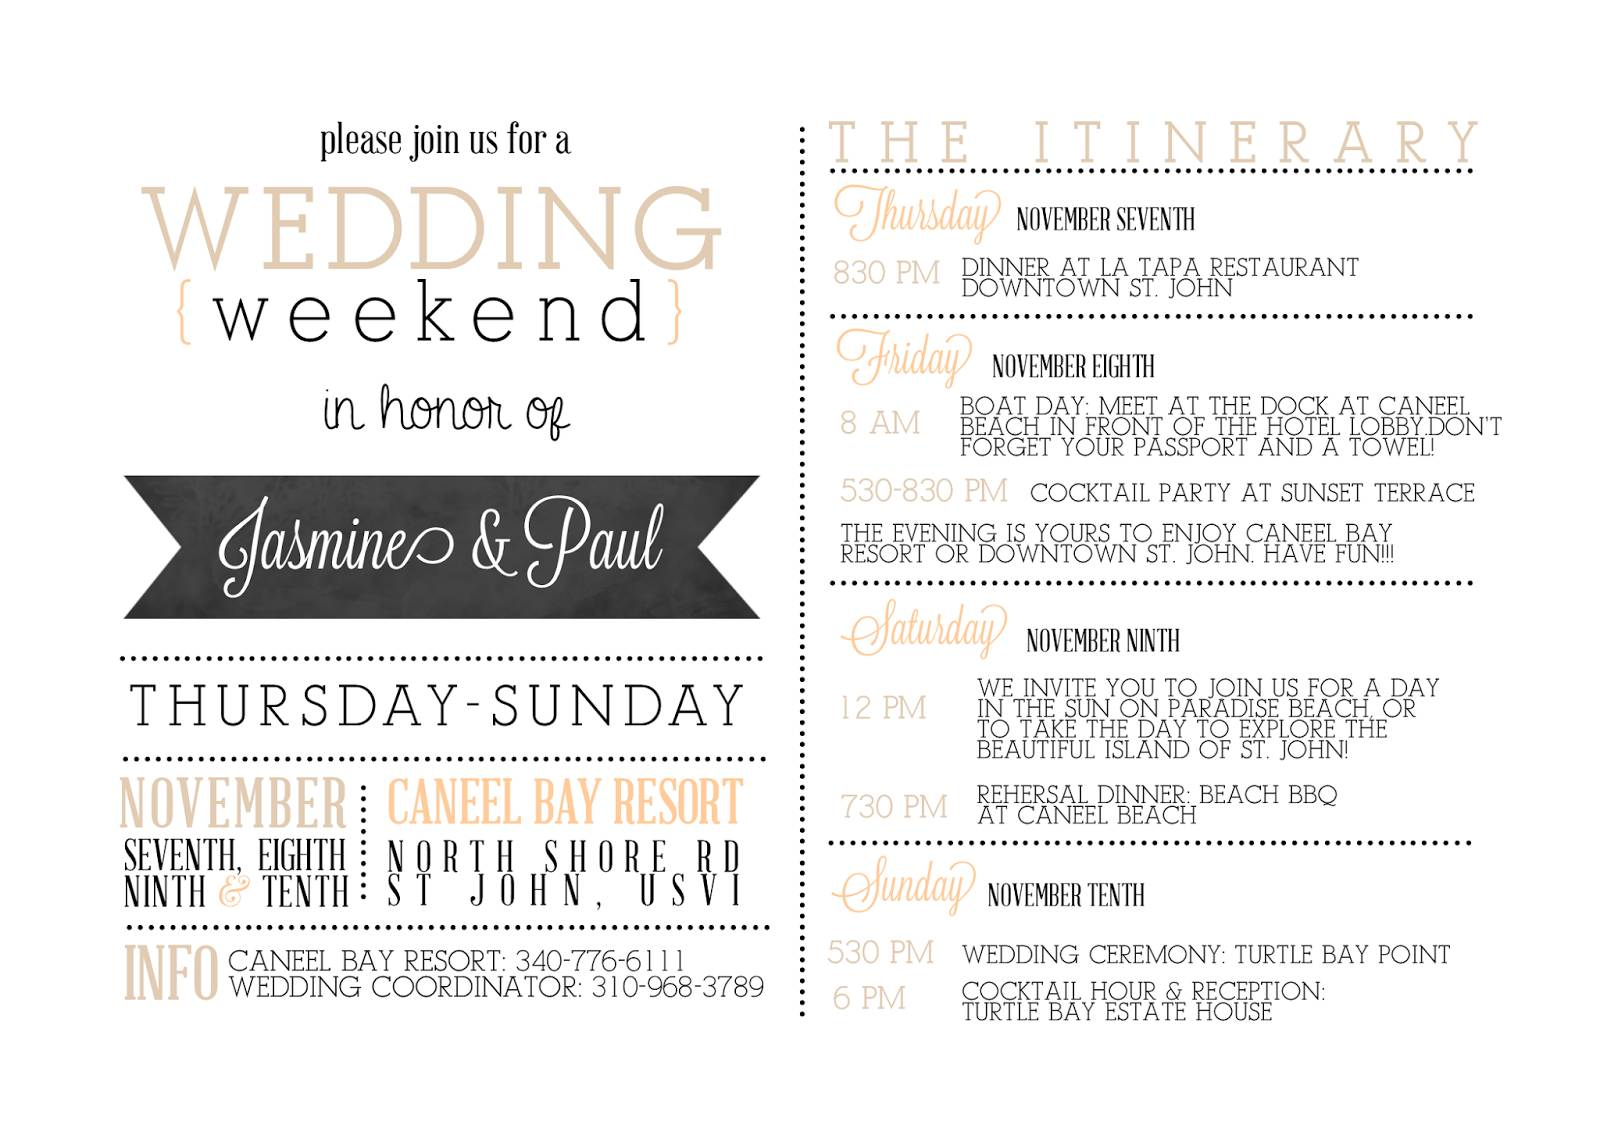 Wedding Weekend Agenda Template